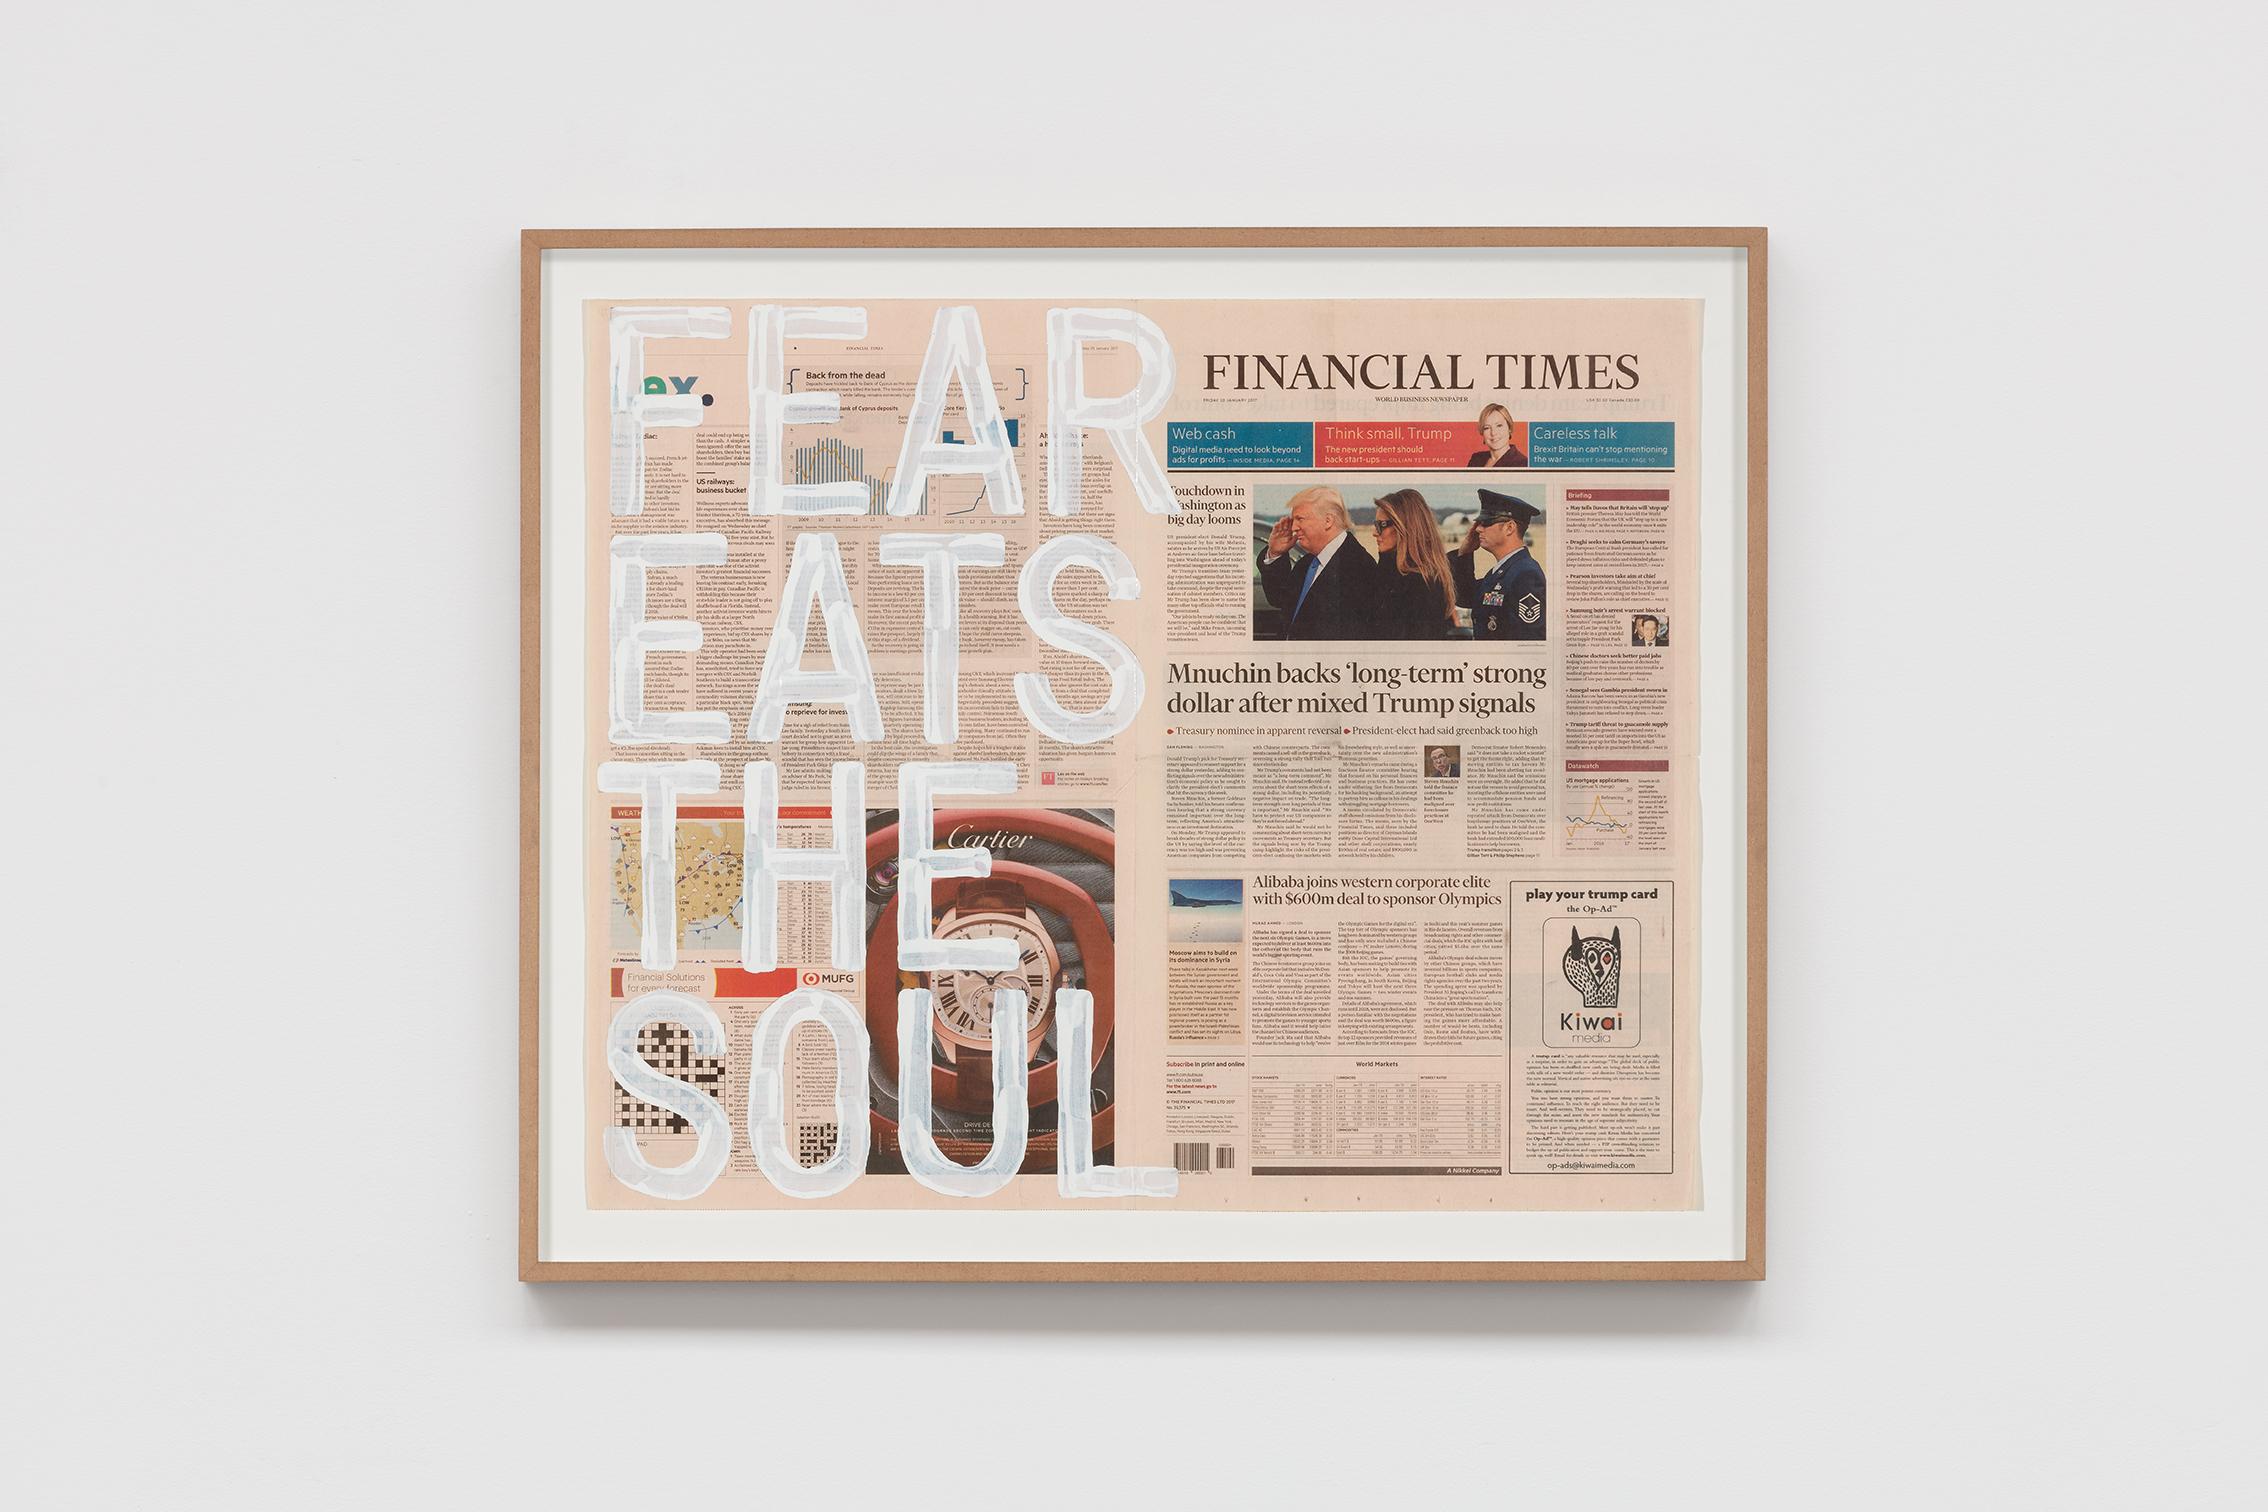 RIRKRIT TIRAVANIJA | Untitled (fear eats the soul/friday january 20, 2017)| 2017